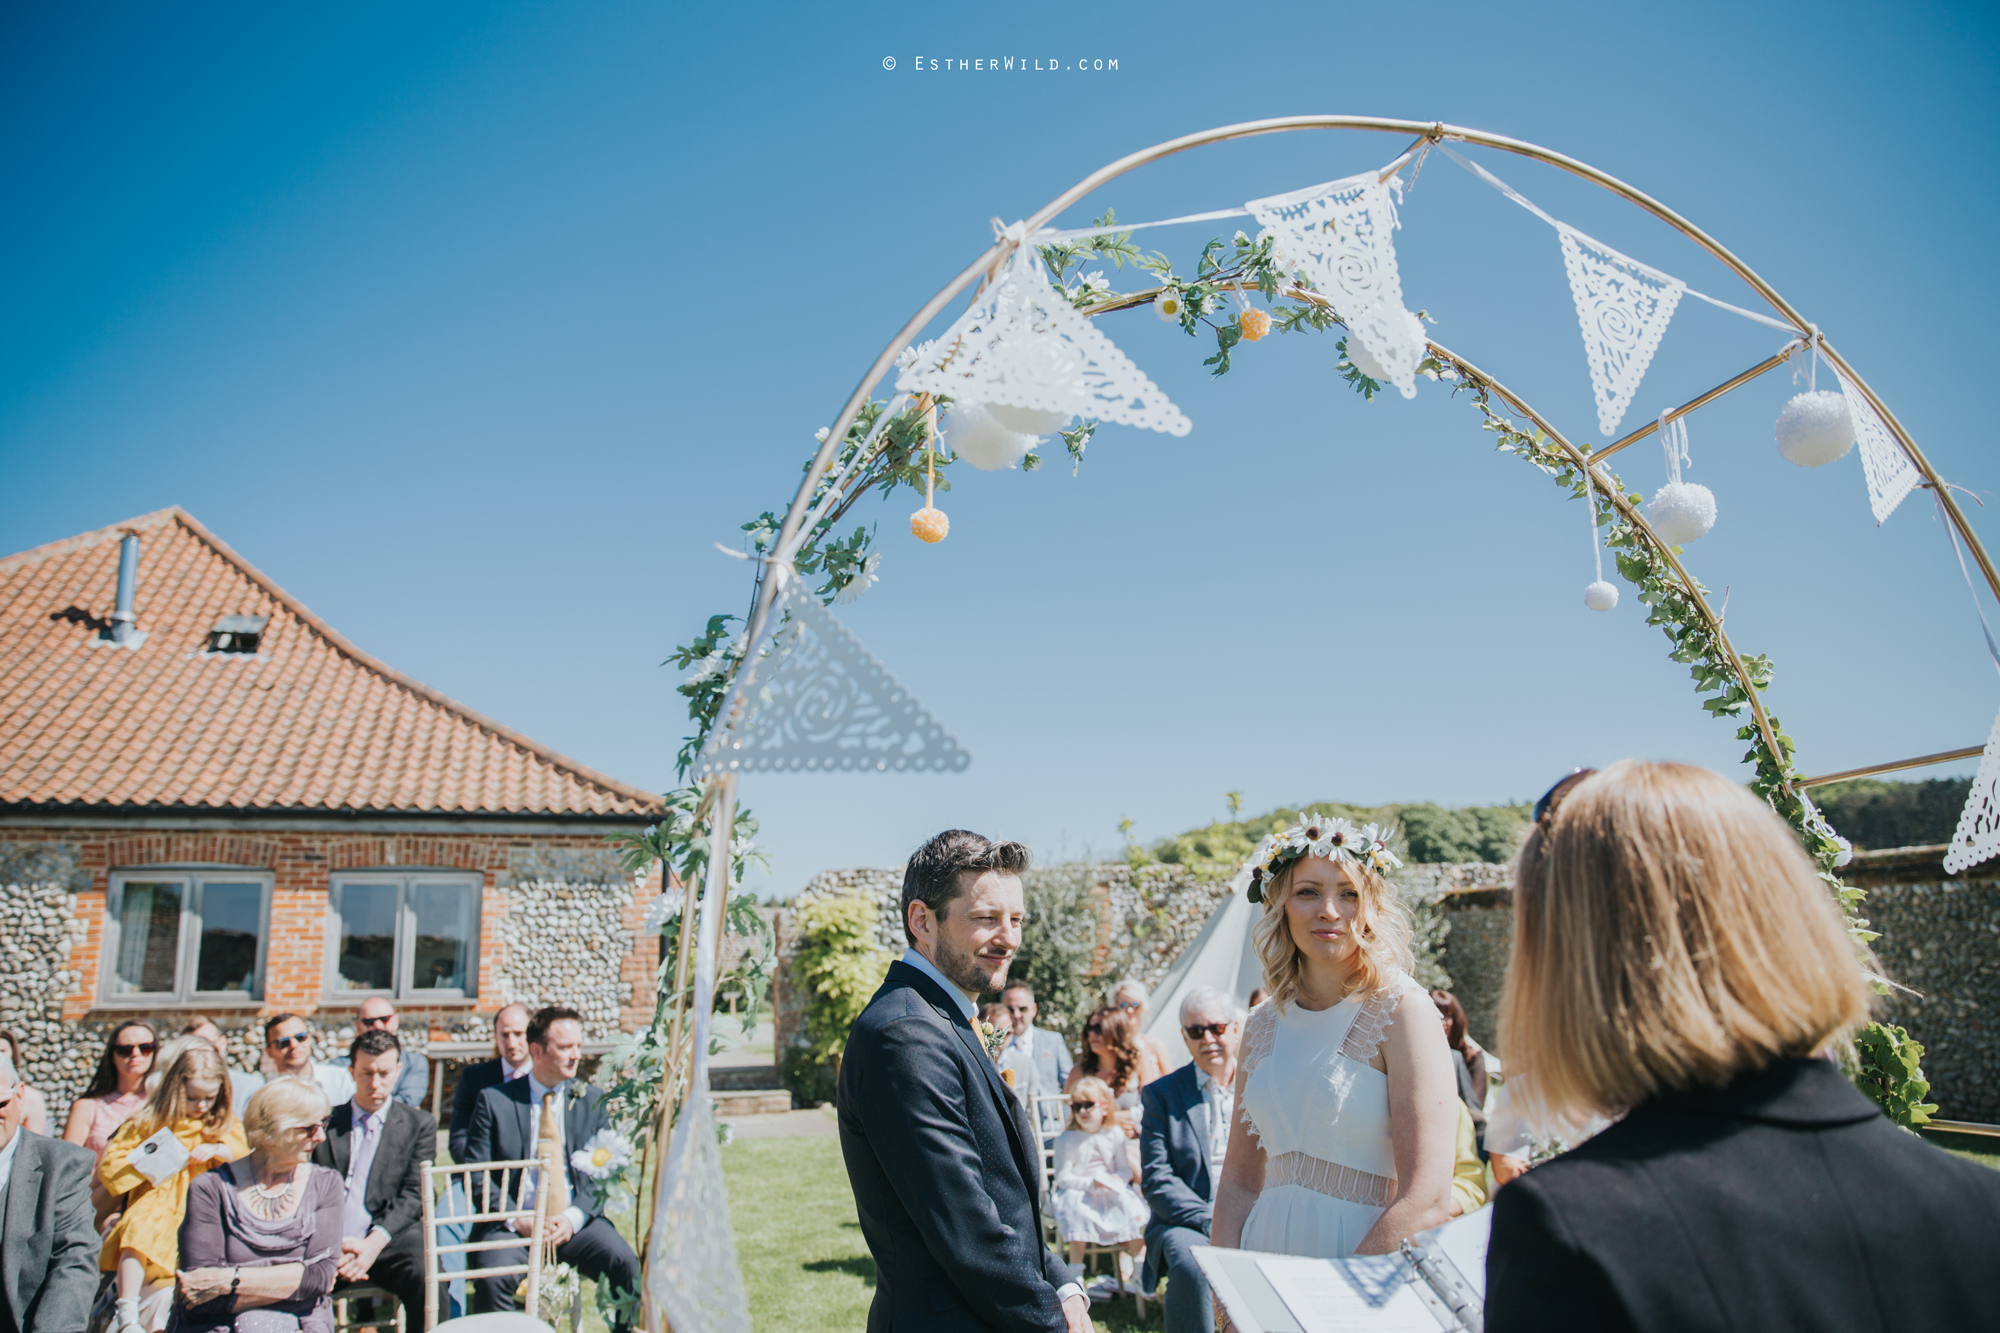 IMG_0539Cley_Barn_Drift_Norfolk_Coast_Wedding_Copyright_Esther_Wild_Photographer_.jpg